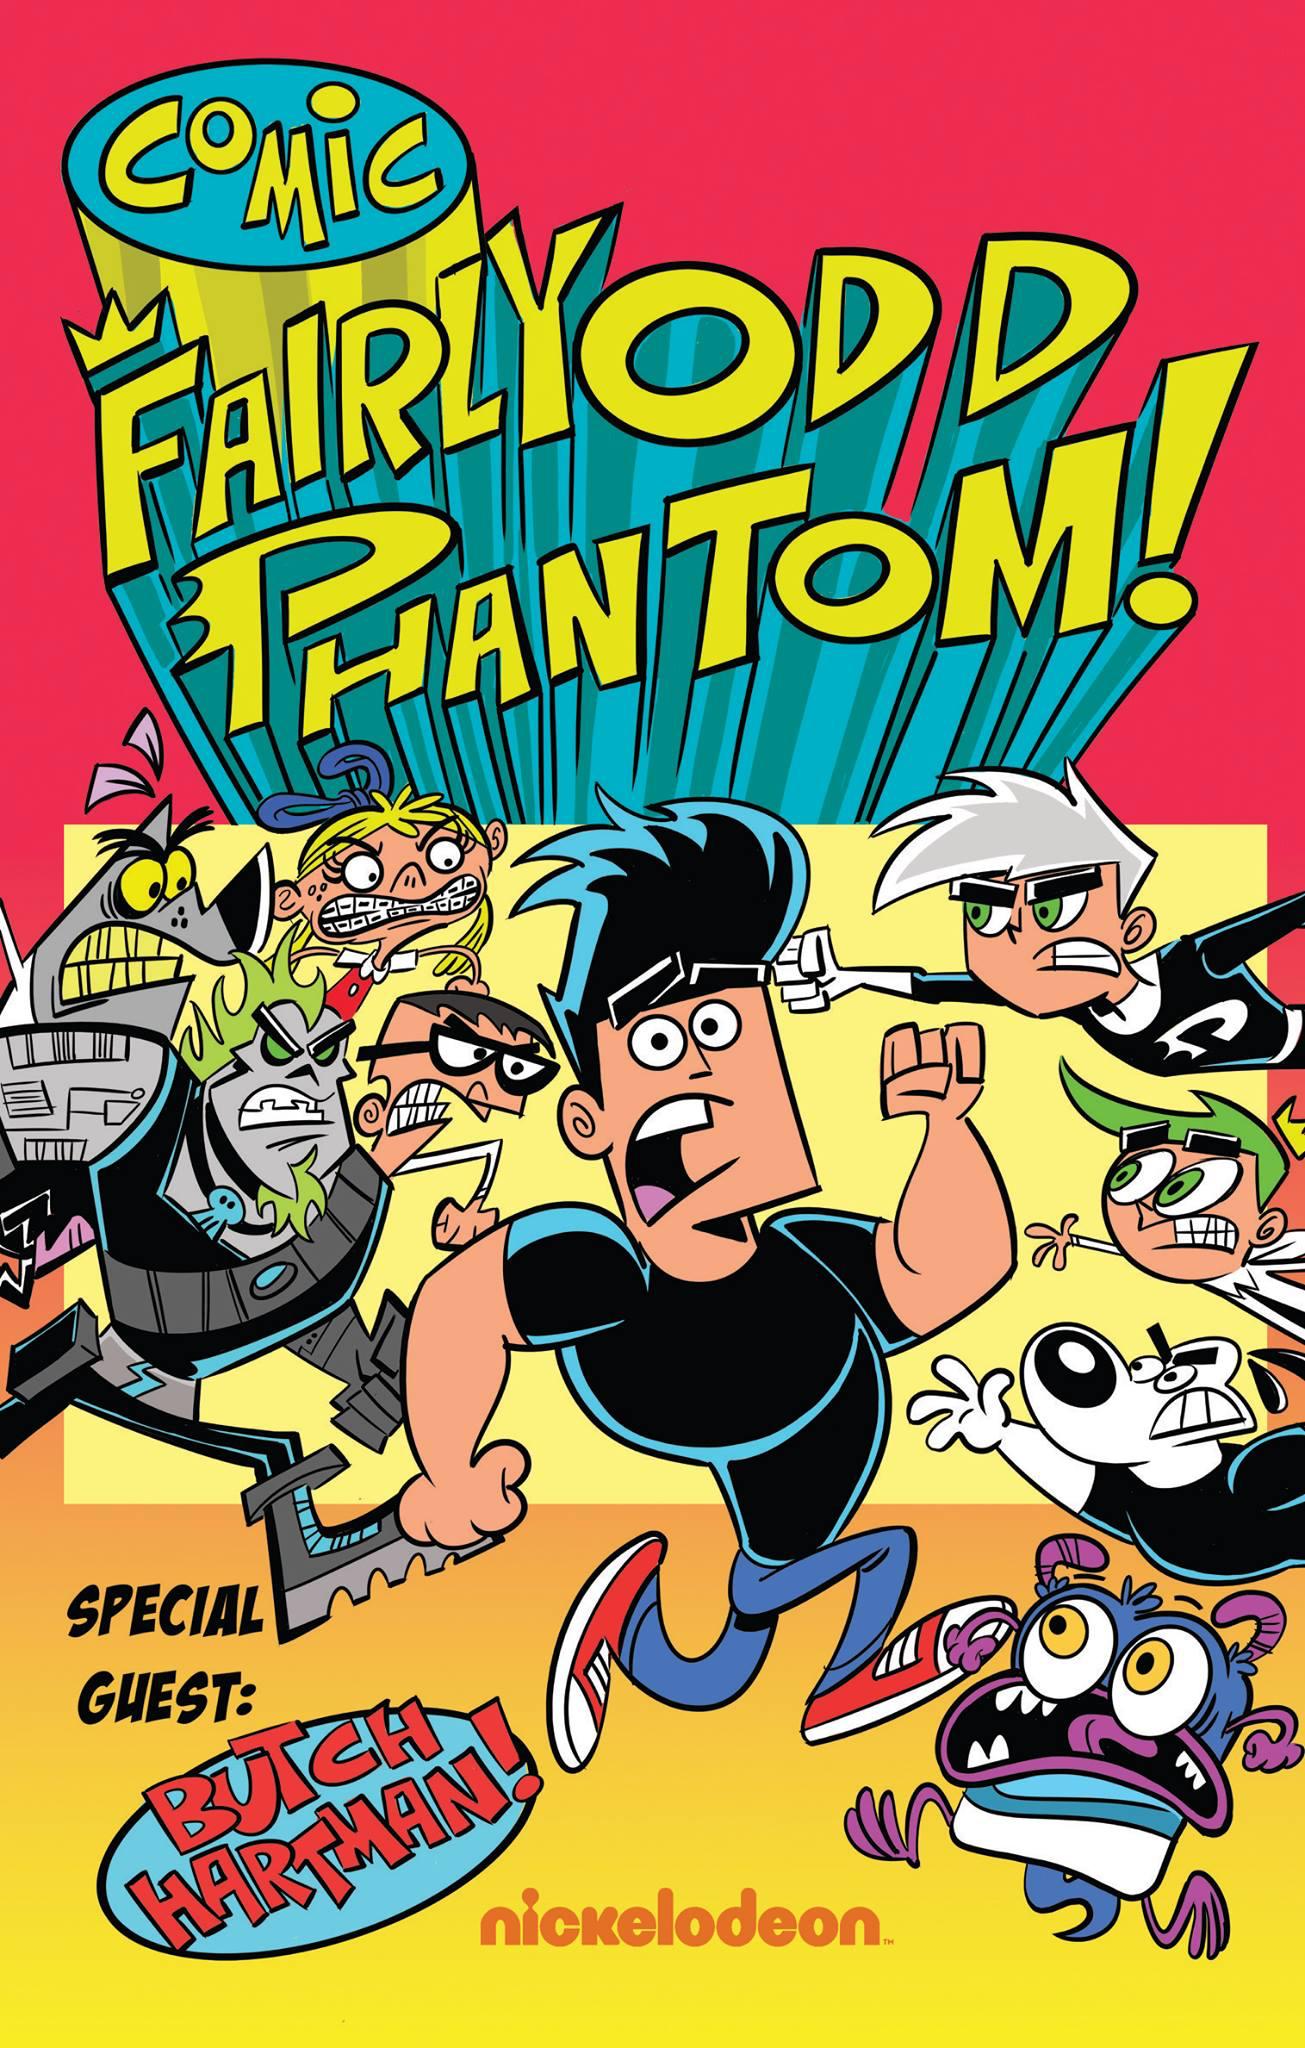 The Fairly Odd Phantom (comic)